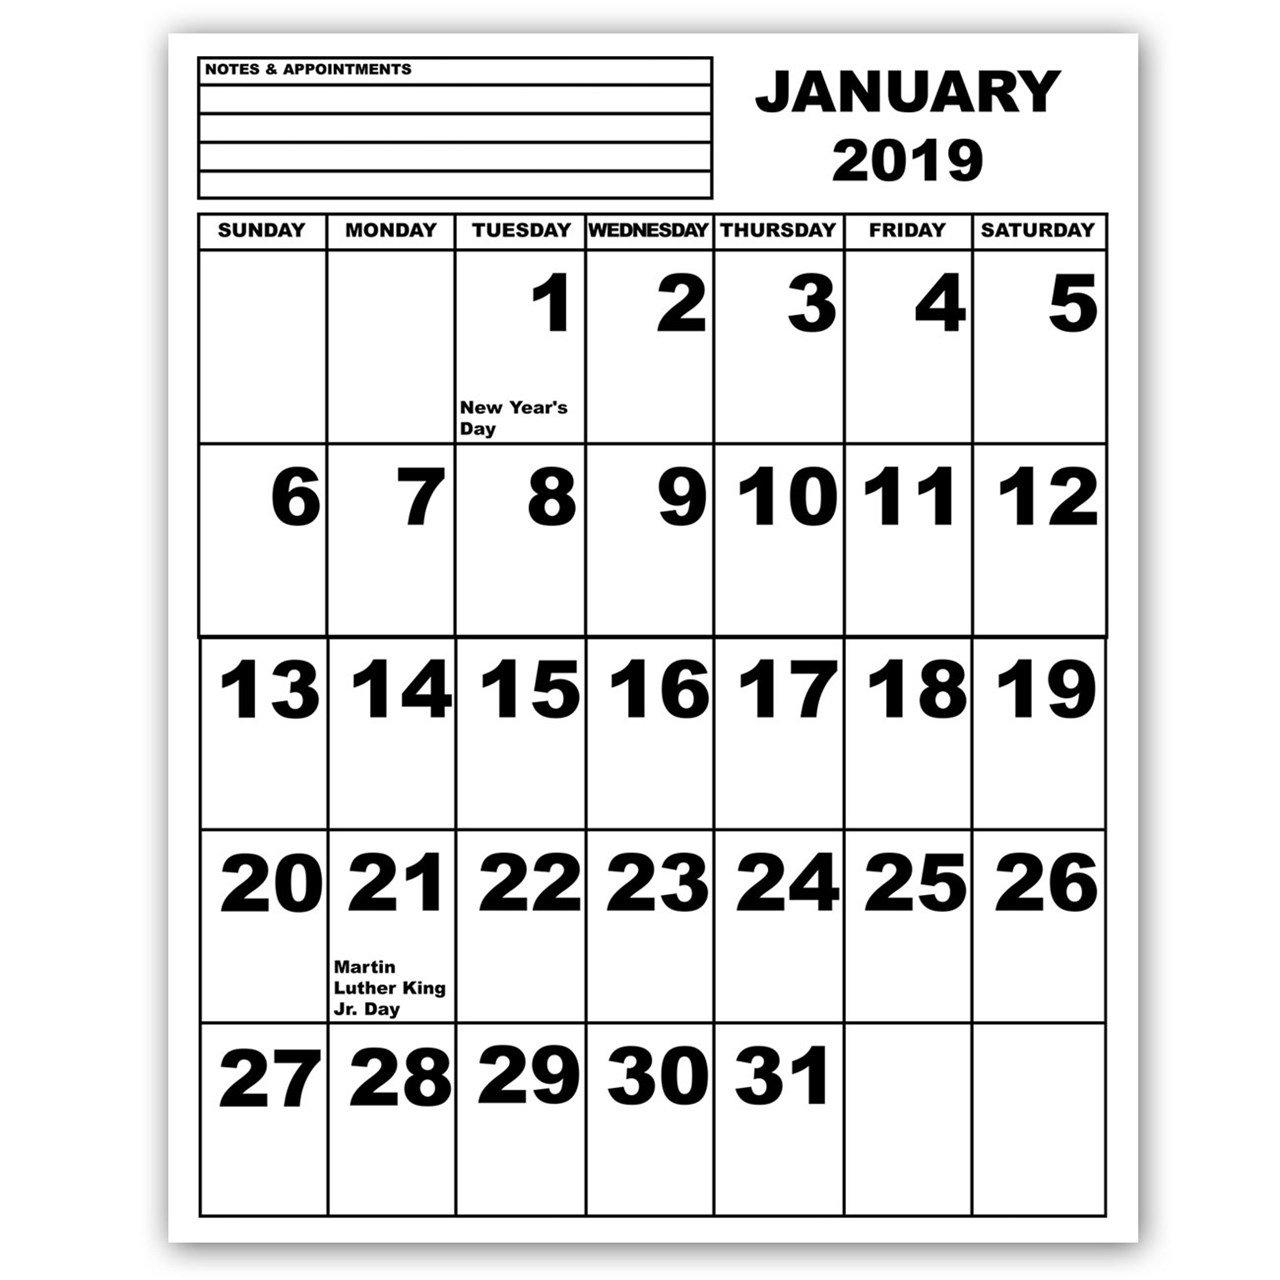 Maxiaids | Jumbo Print Calendar – 2019 Calendar 2019 With Pictures